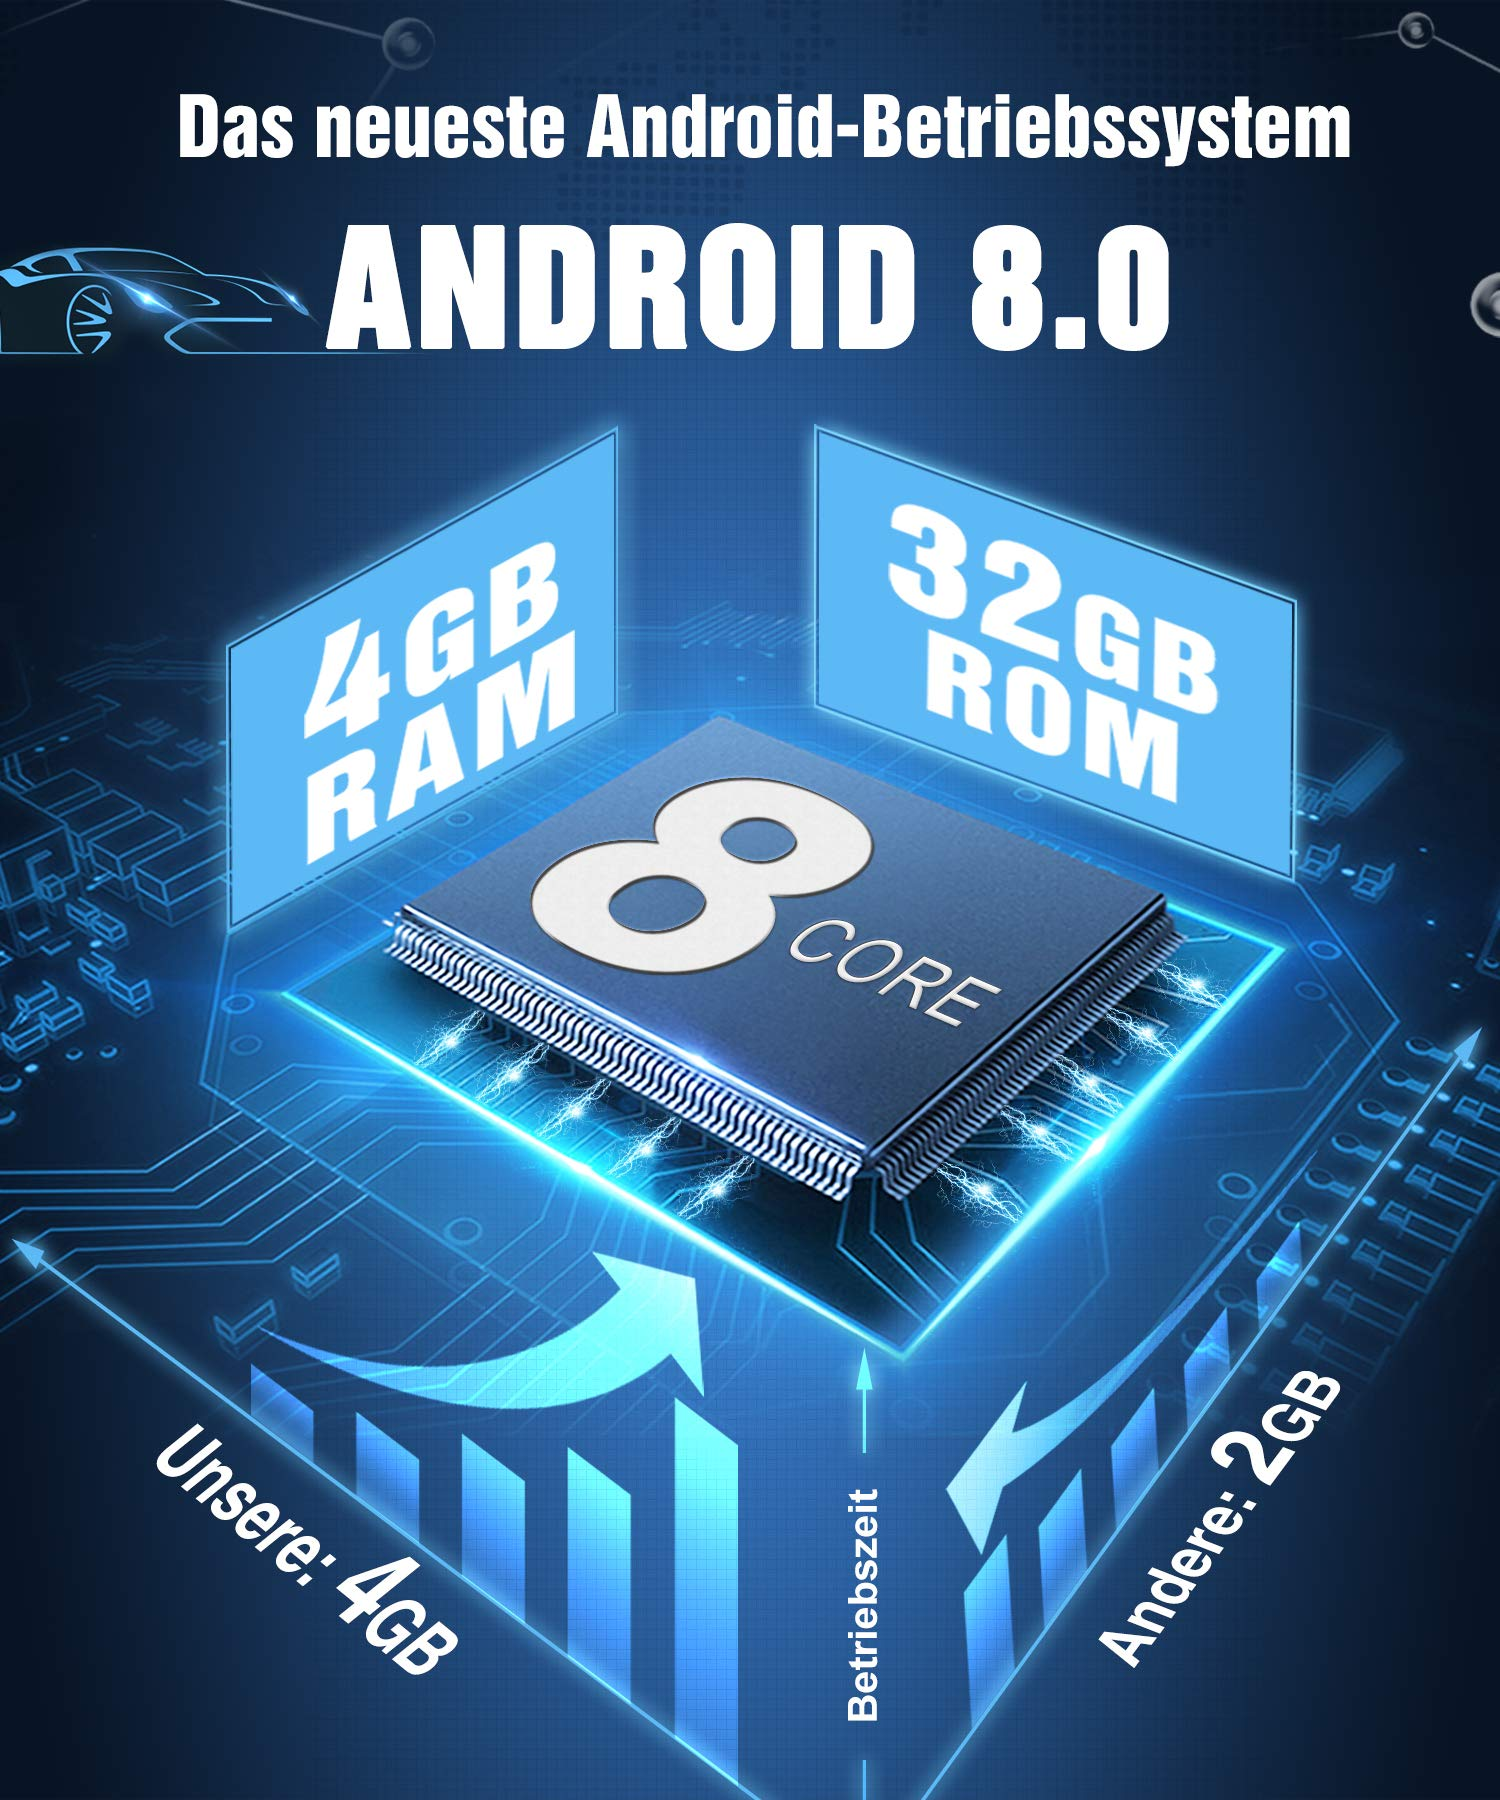 Pumpkin-Android-80-Autoradio-fr-VW-Radio-mit-Navi-4GB-Untersttzt-Bluetooth-DAB-USB-CD-DVD-Android-Auto-WLAN-4G-MicroSD-2-Din-8-Zoll-Bildschirm-Universal